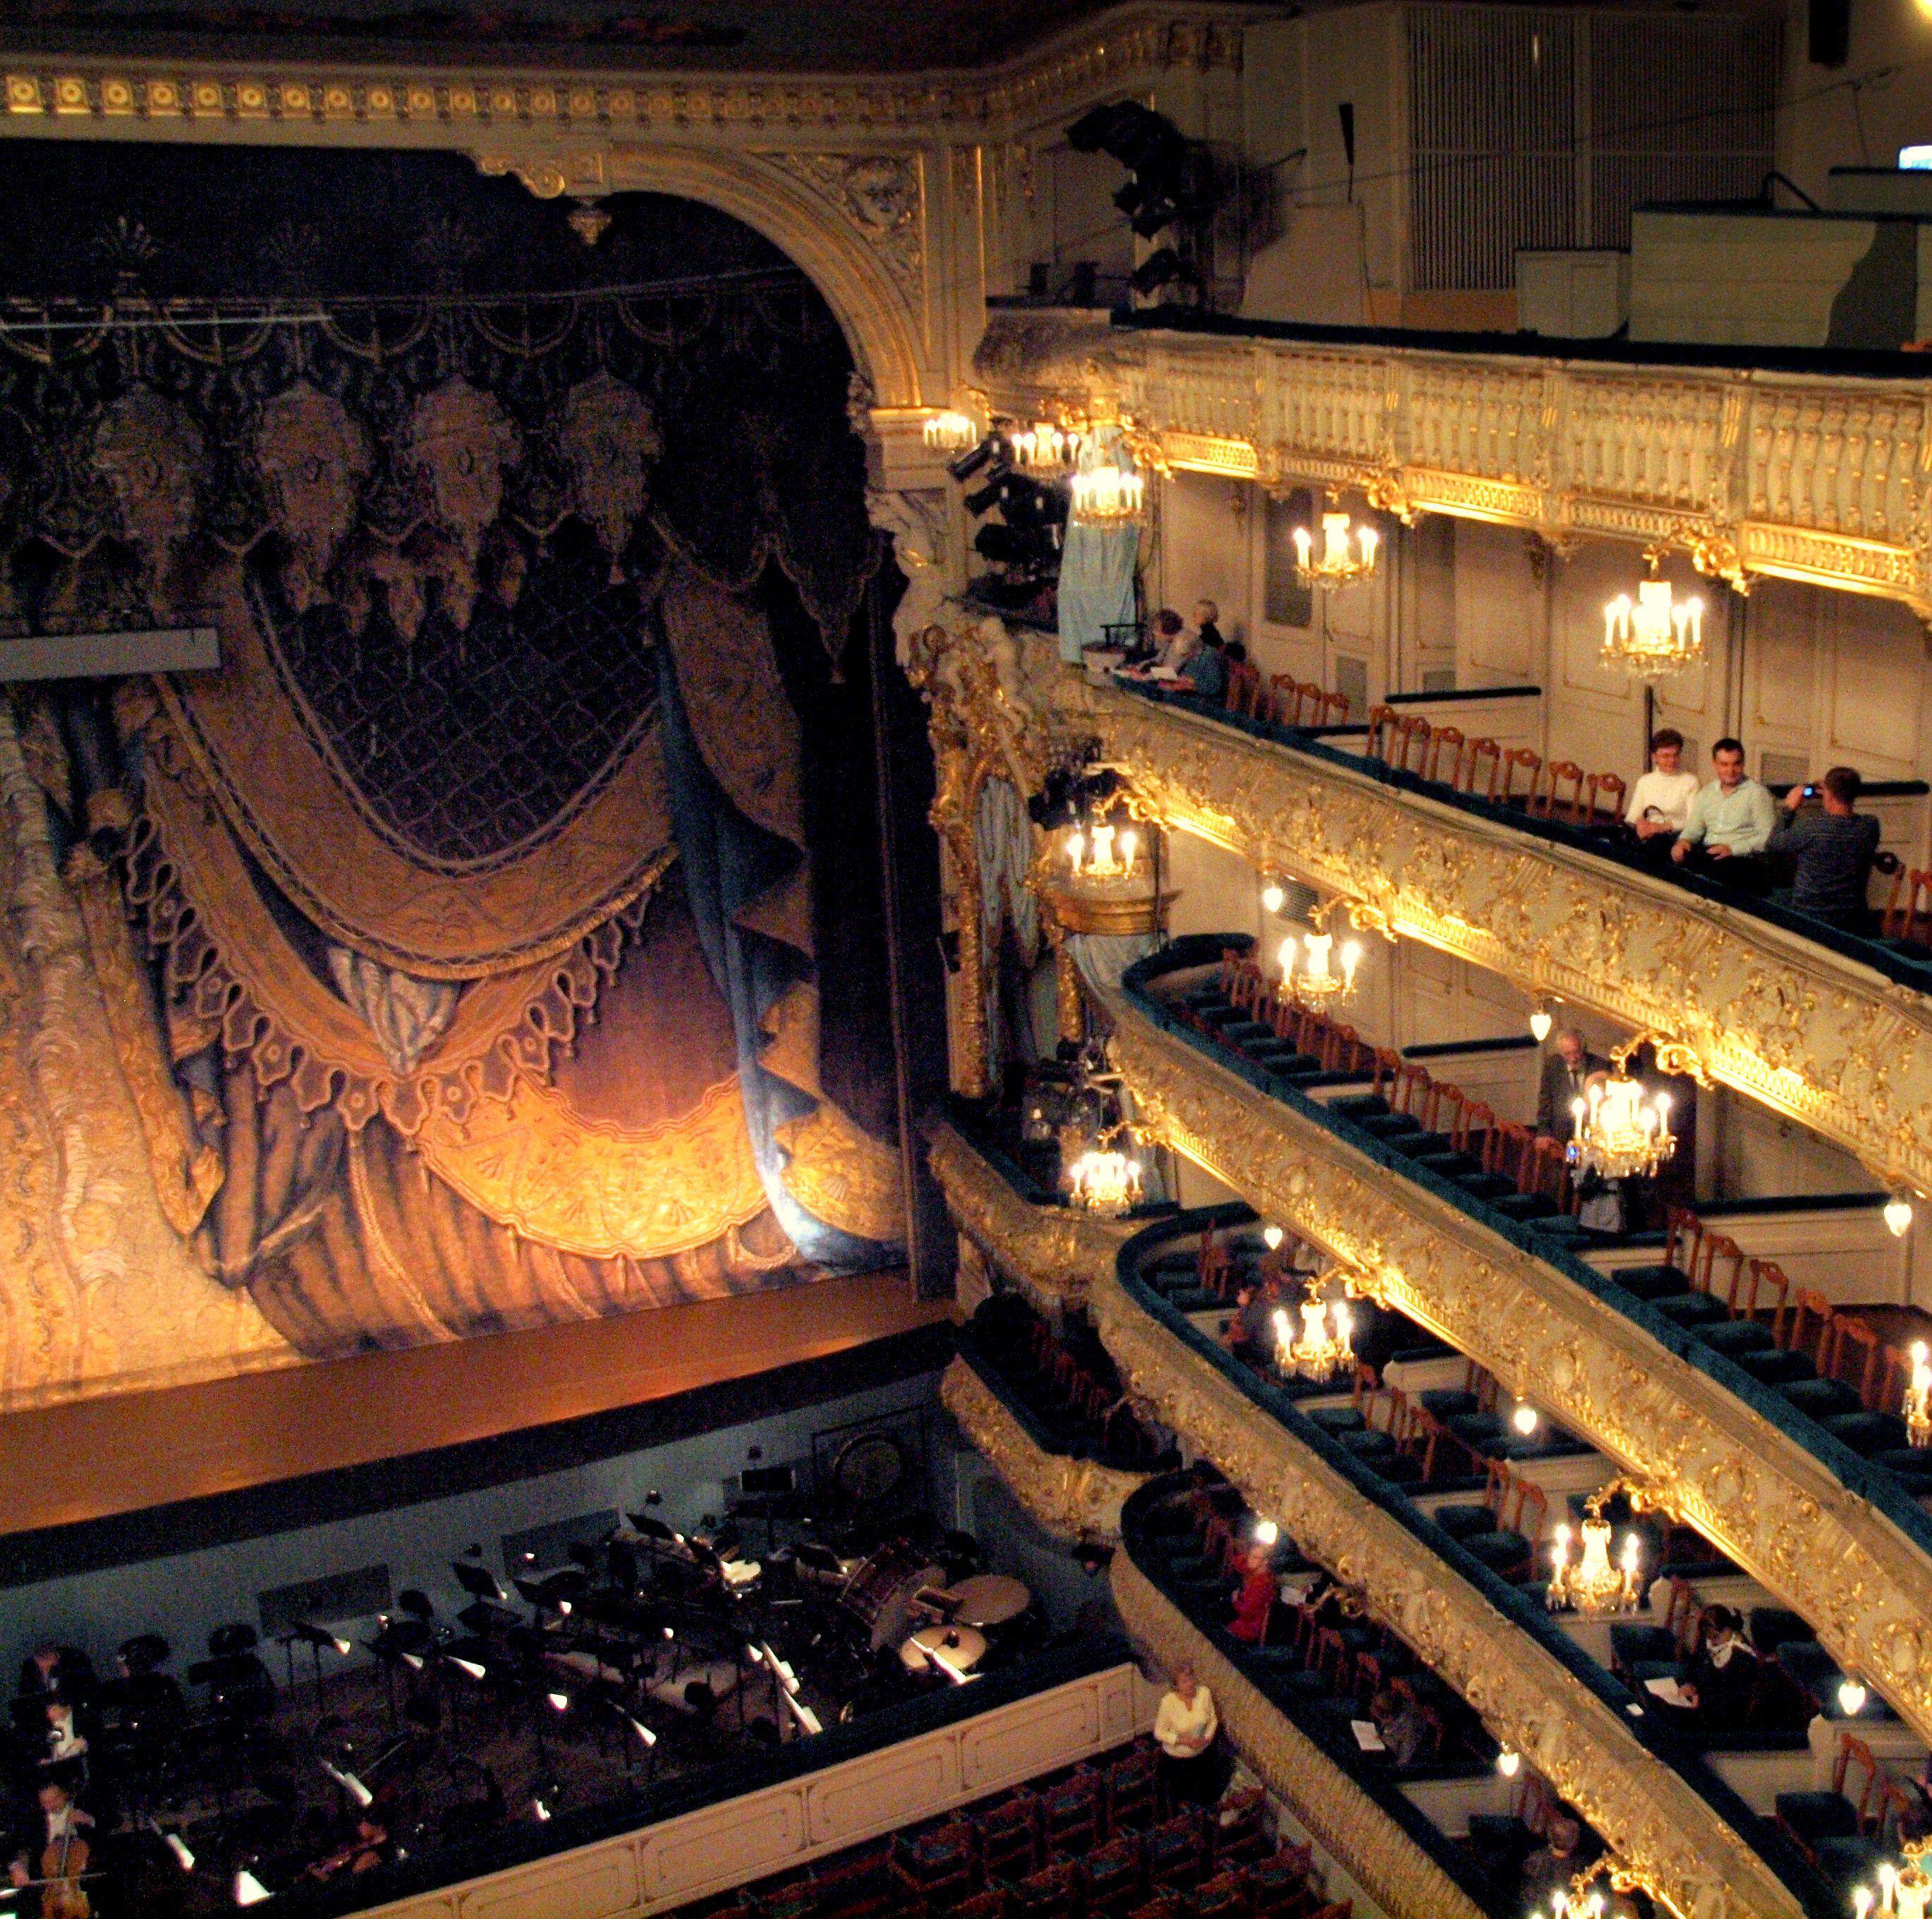 The lavish Mariinsky Theatre in Saint Petersburg, Russia